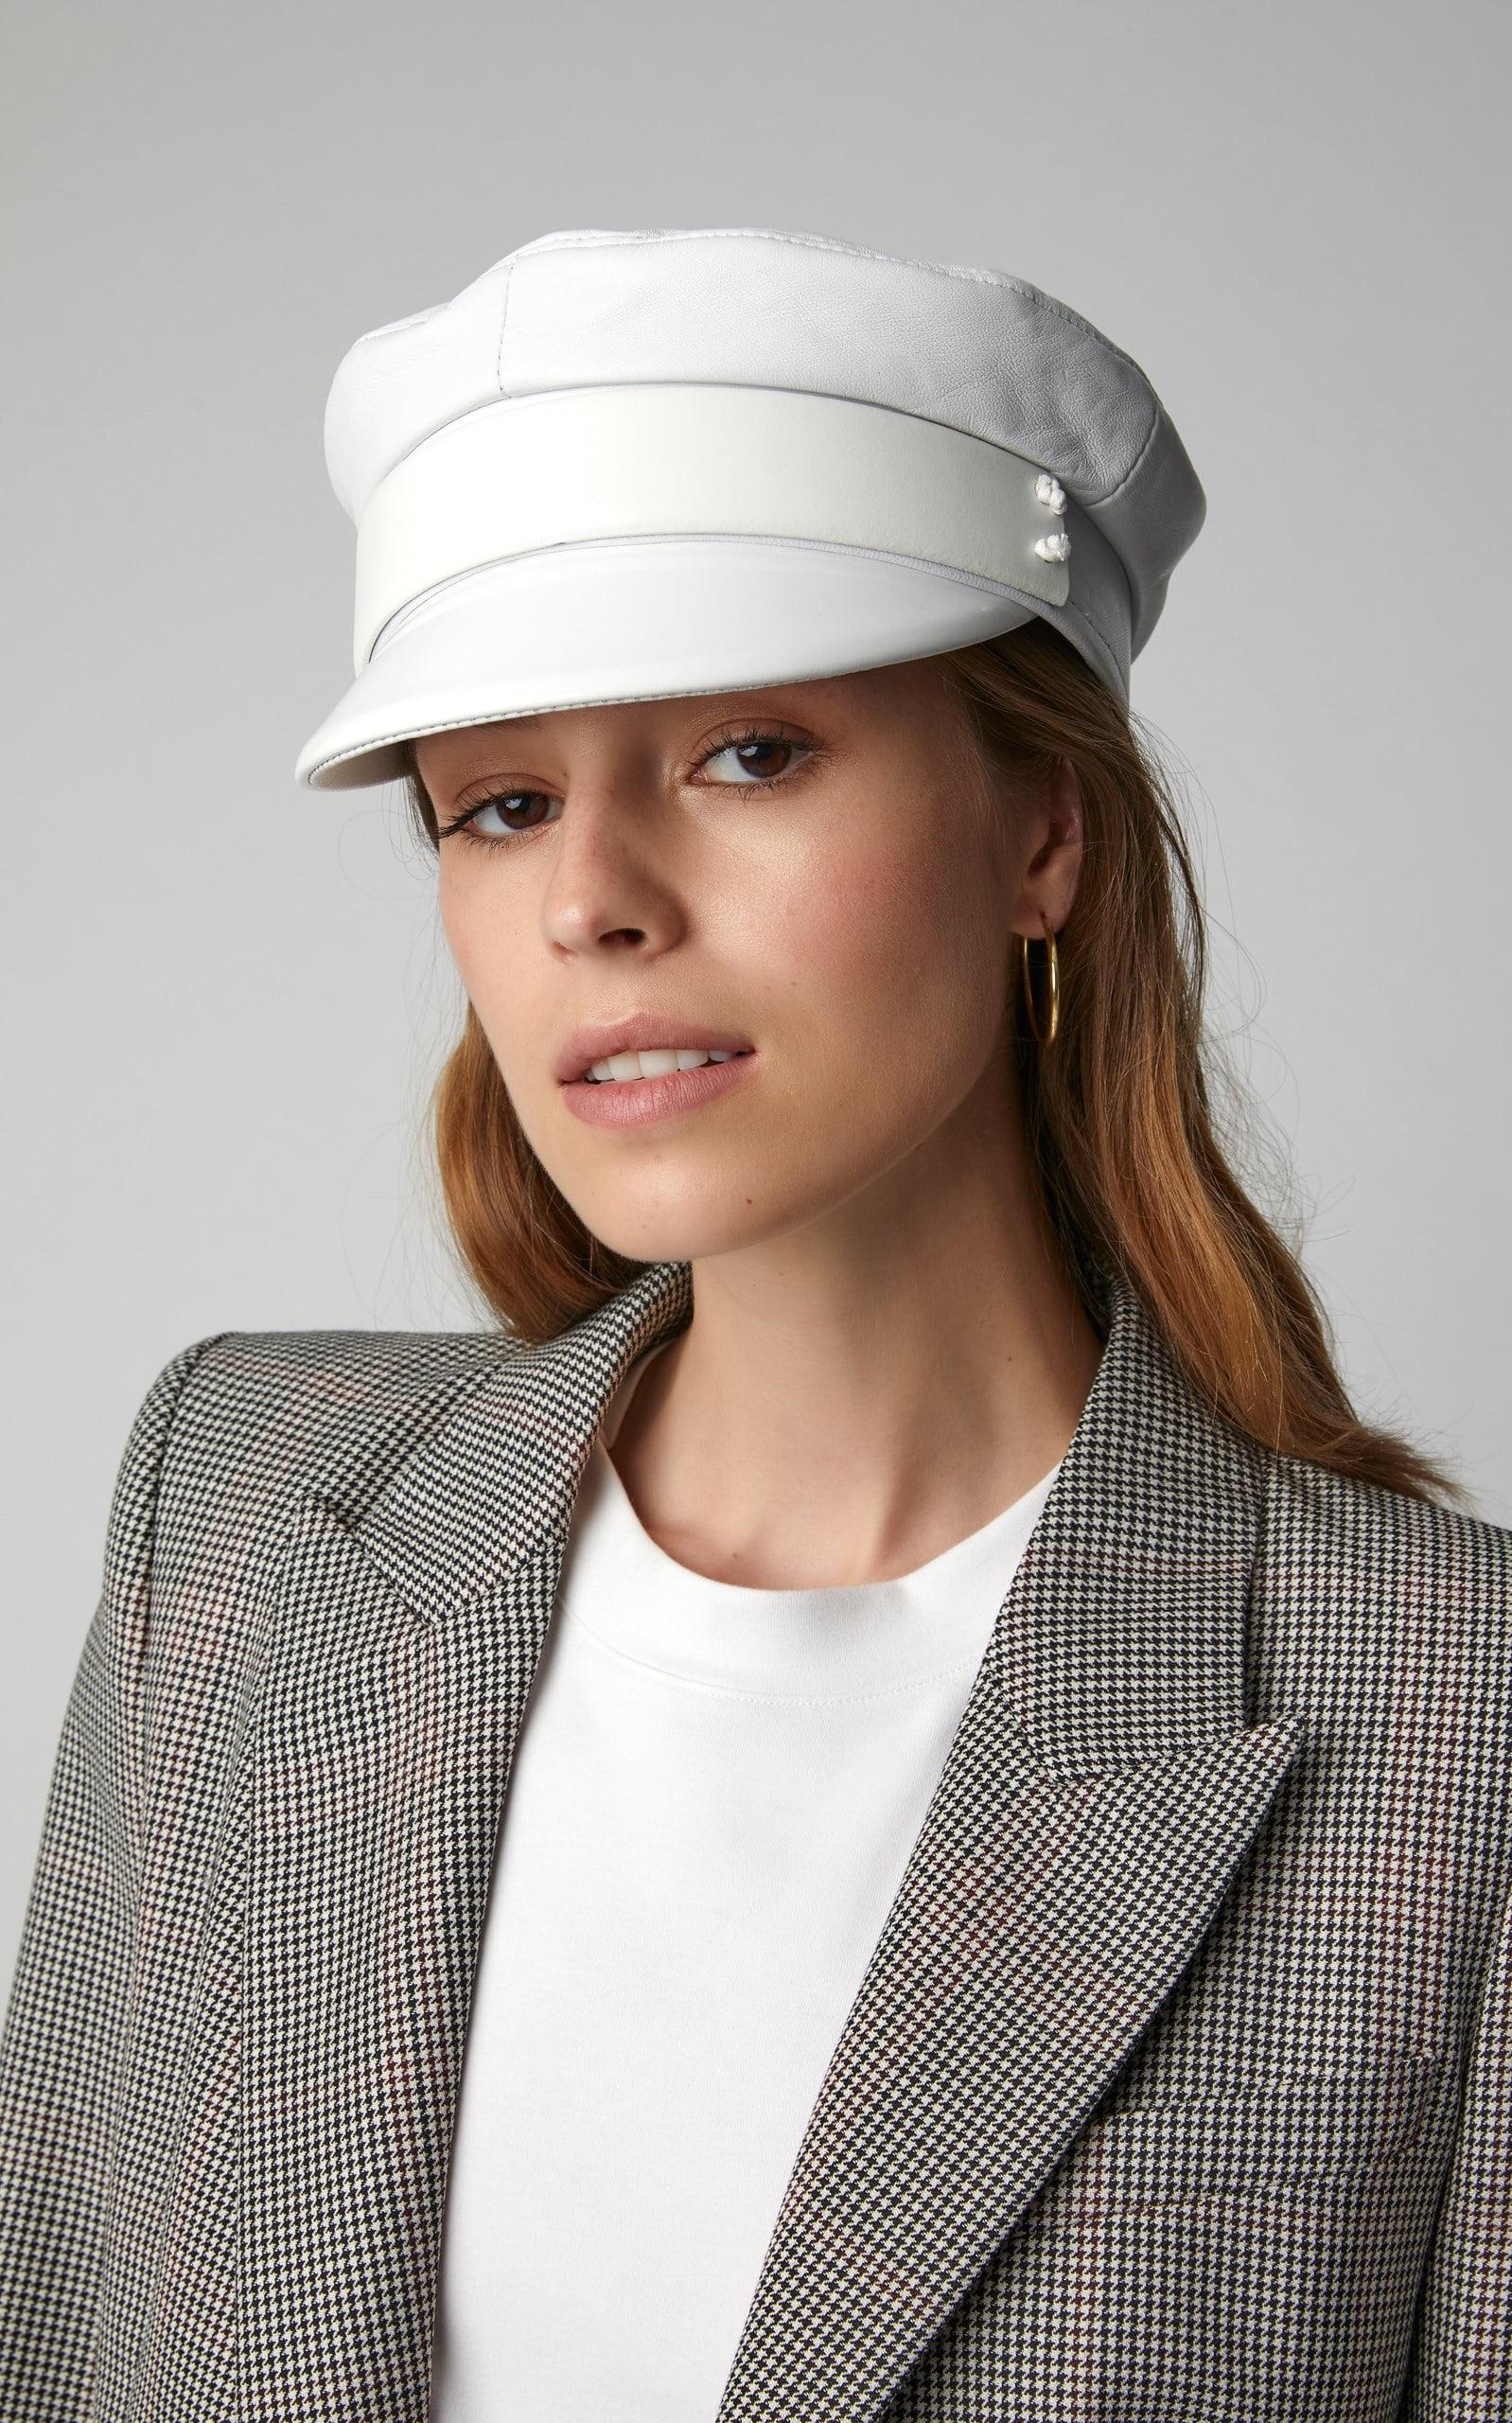 The Best Trends in Spring/Summer Hats, baker boy hat, spring hats